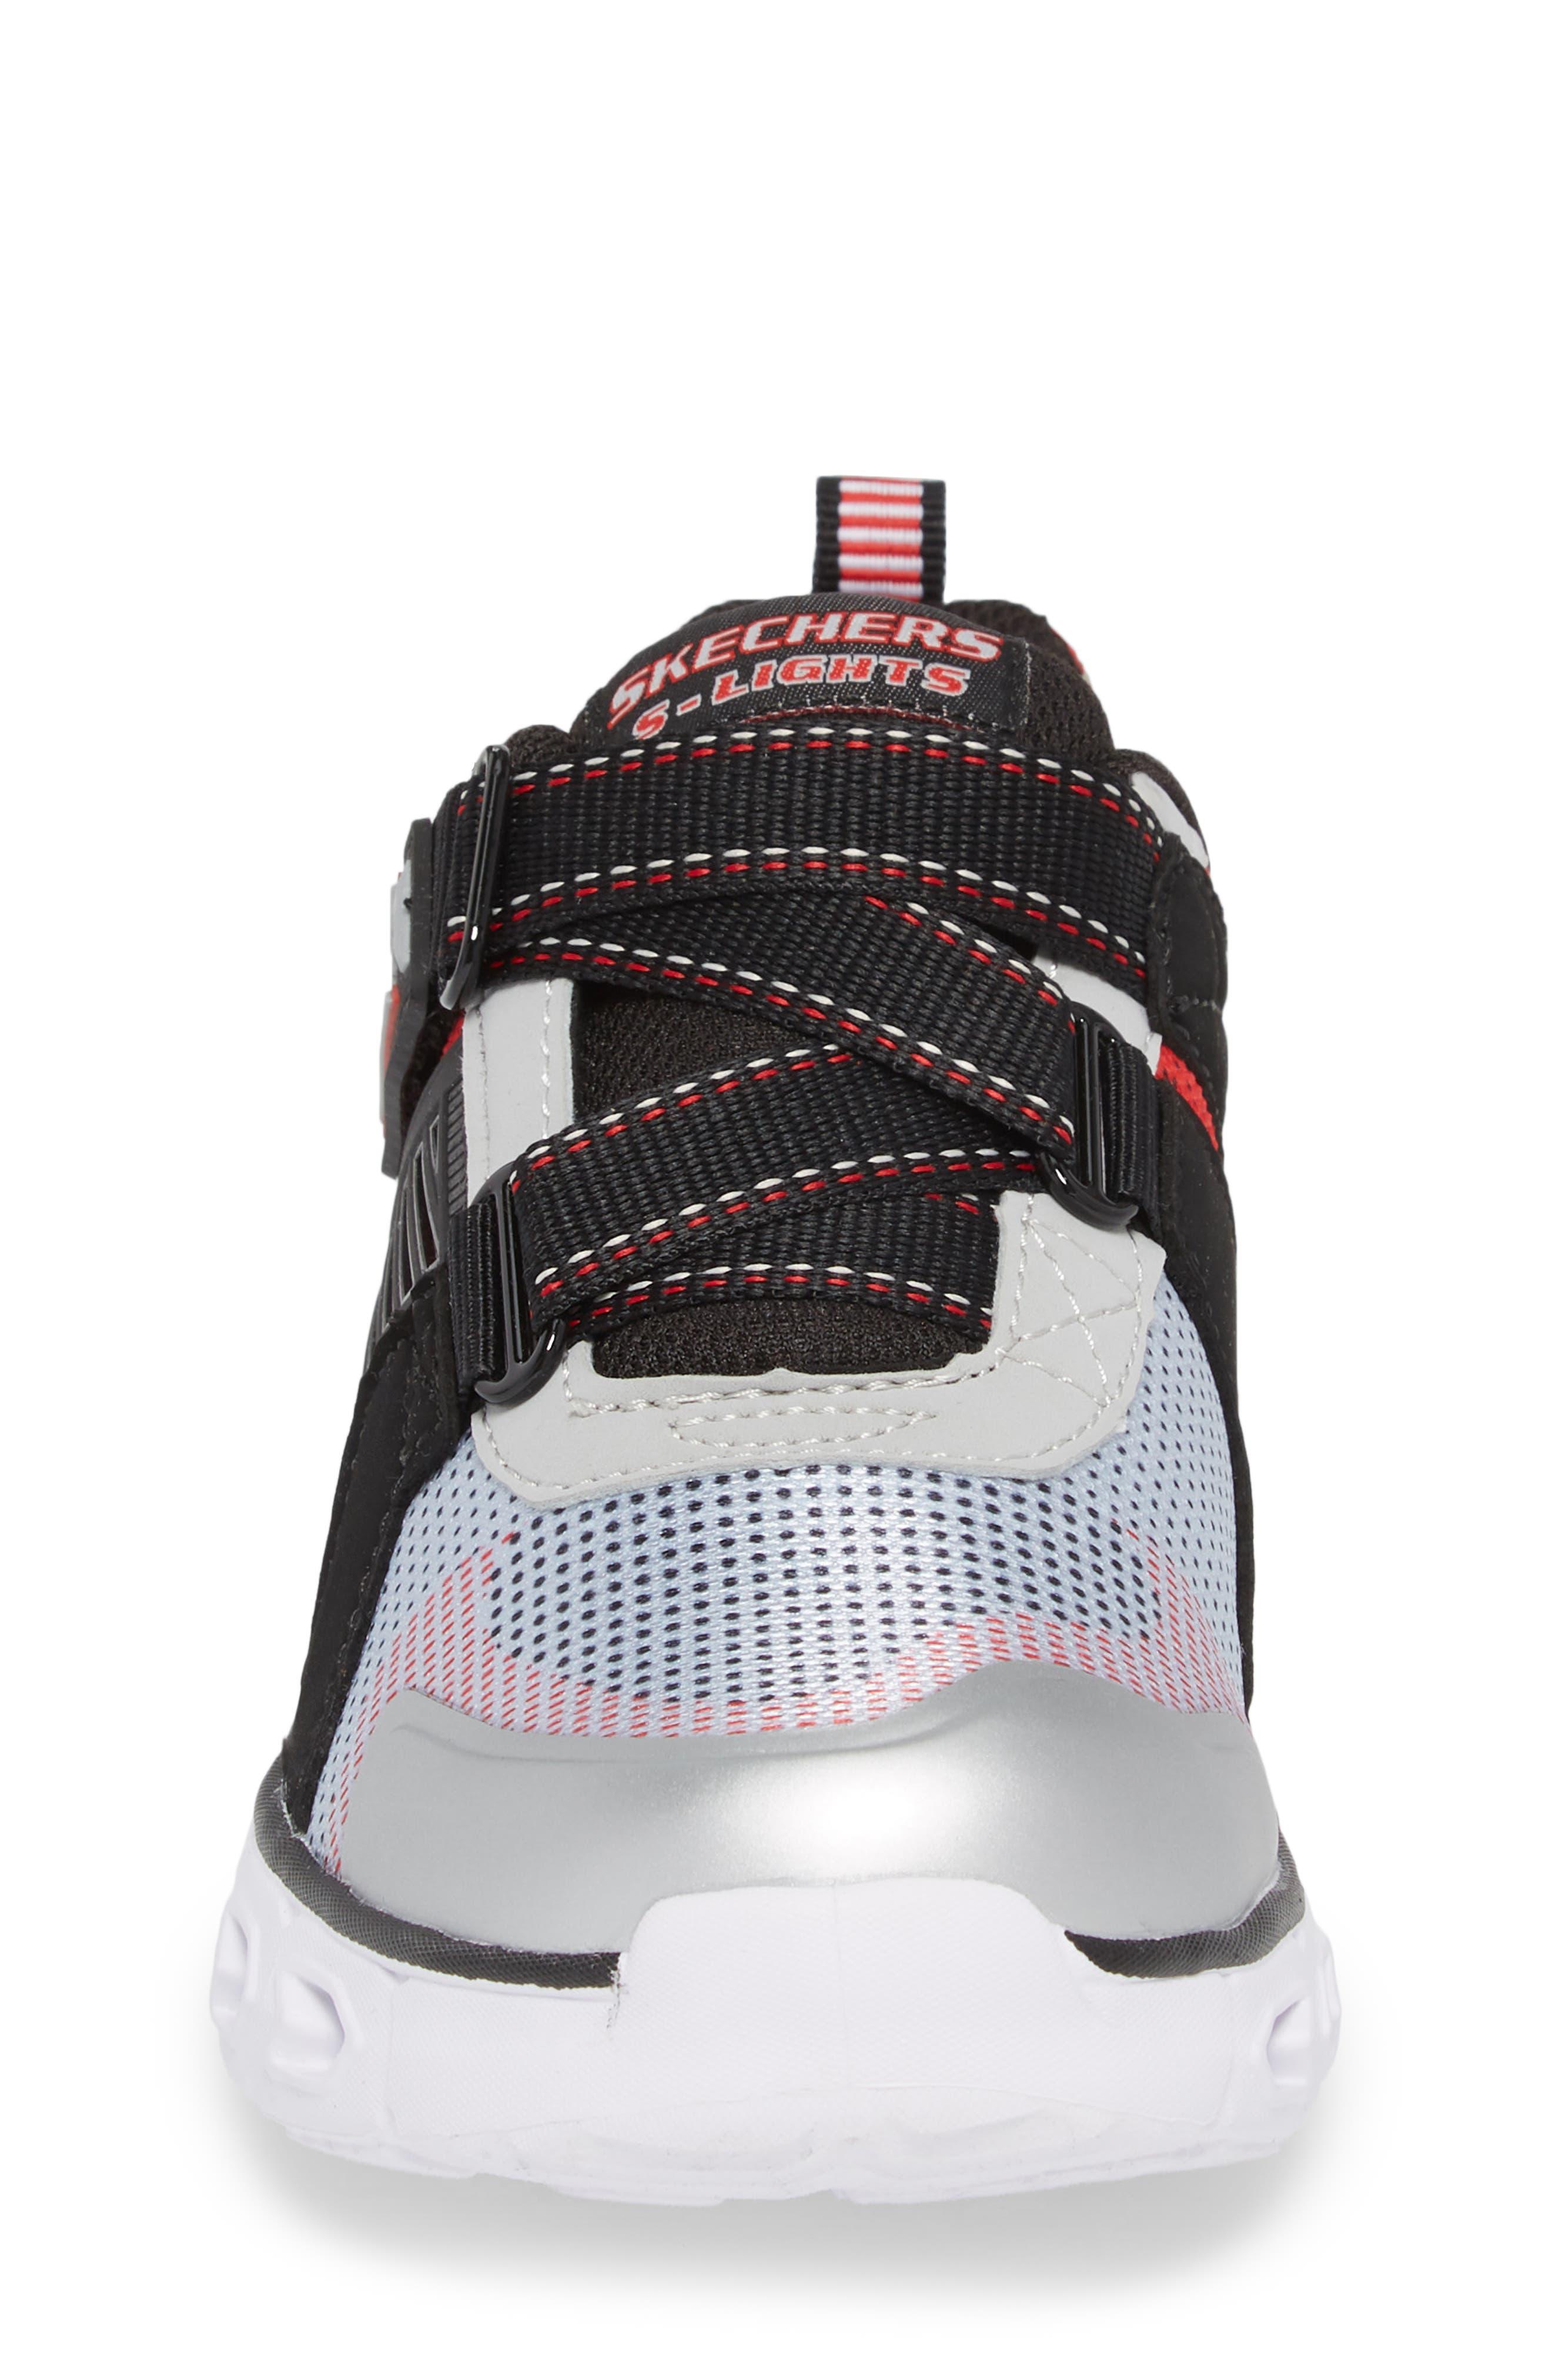 Hypno-Flash 2.0 Rapid Quake Sneakers,                             Alternate thumbnail 4, color,